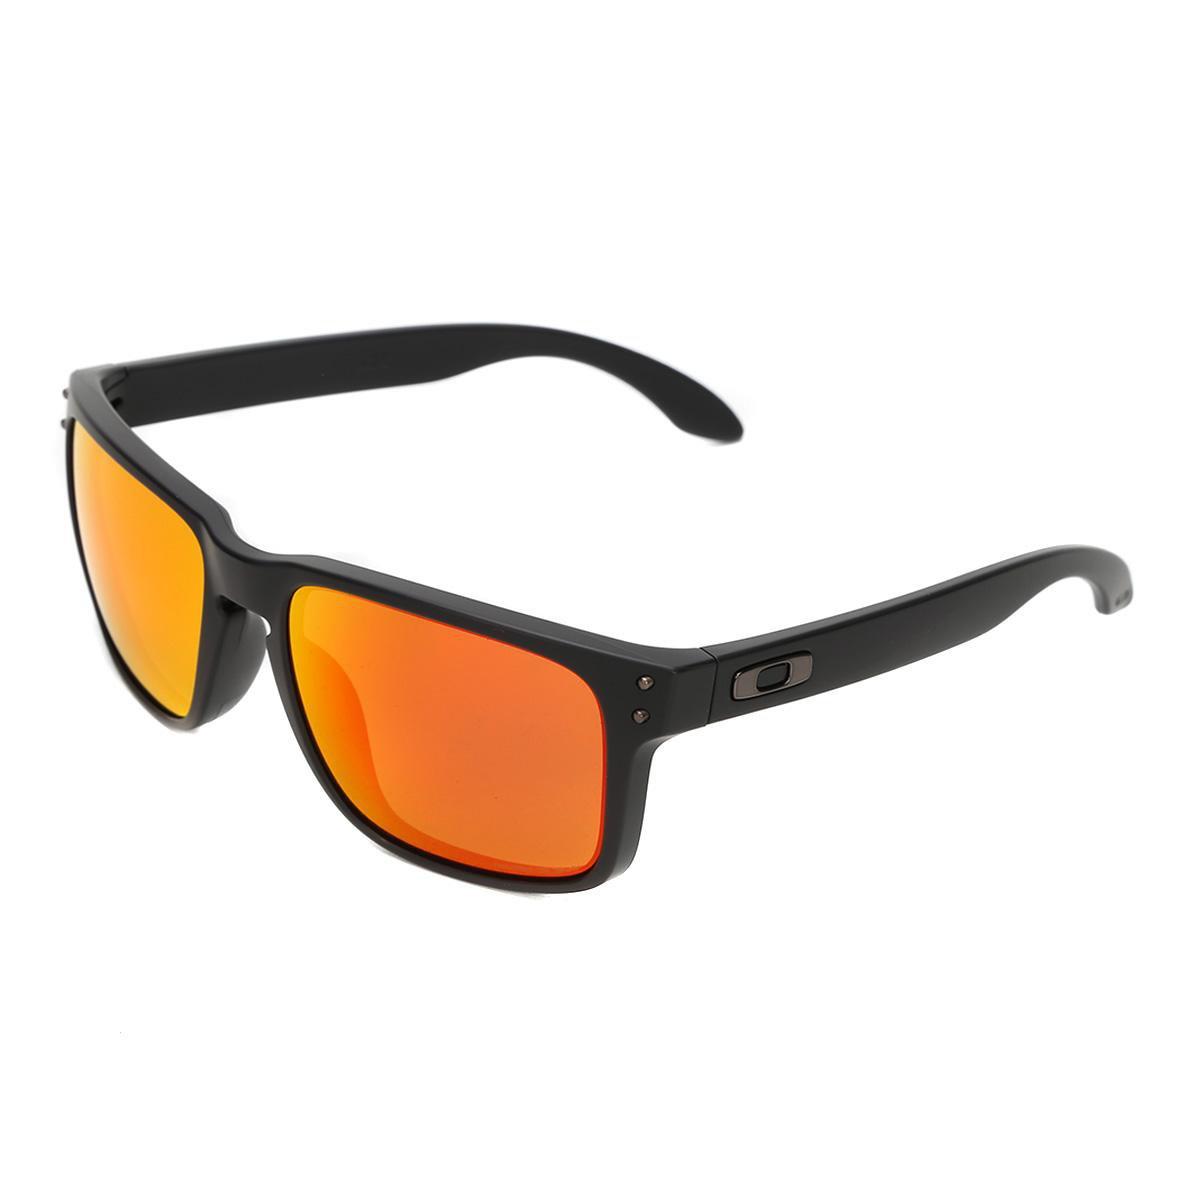 09b359df9efa3 Oculos Da Oakley Holbrook Branco – Southern California Weather Force